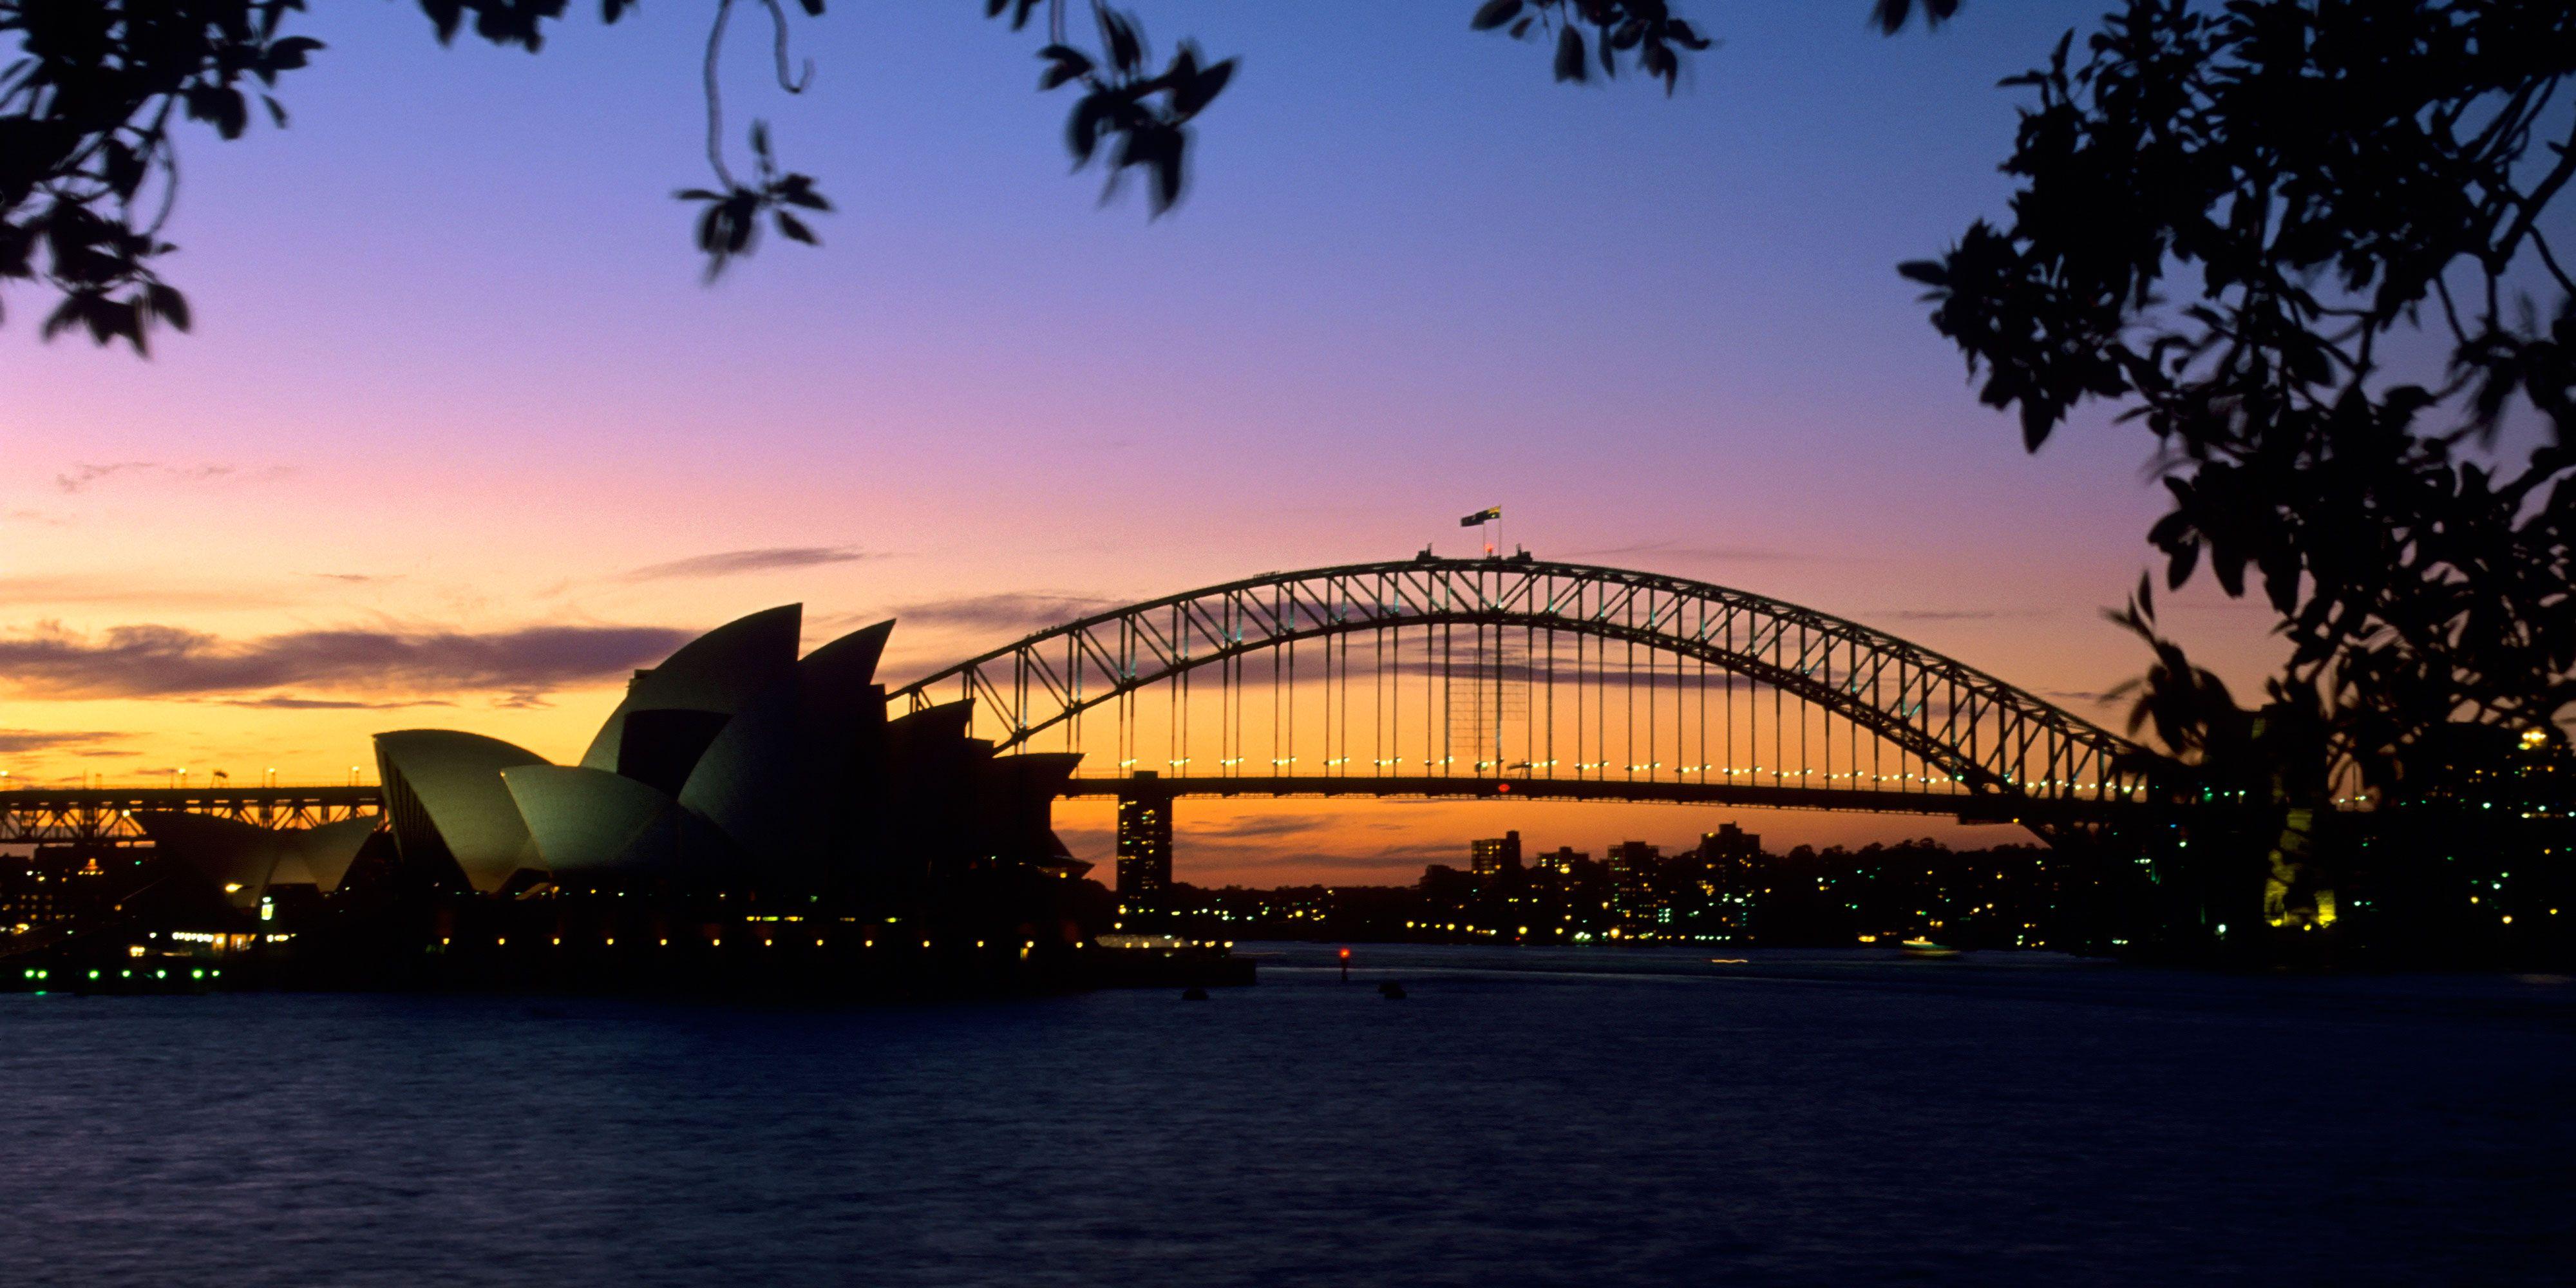 The Harbour Bridge in Sydney